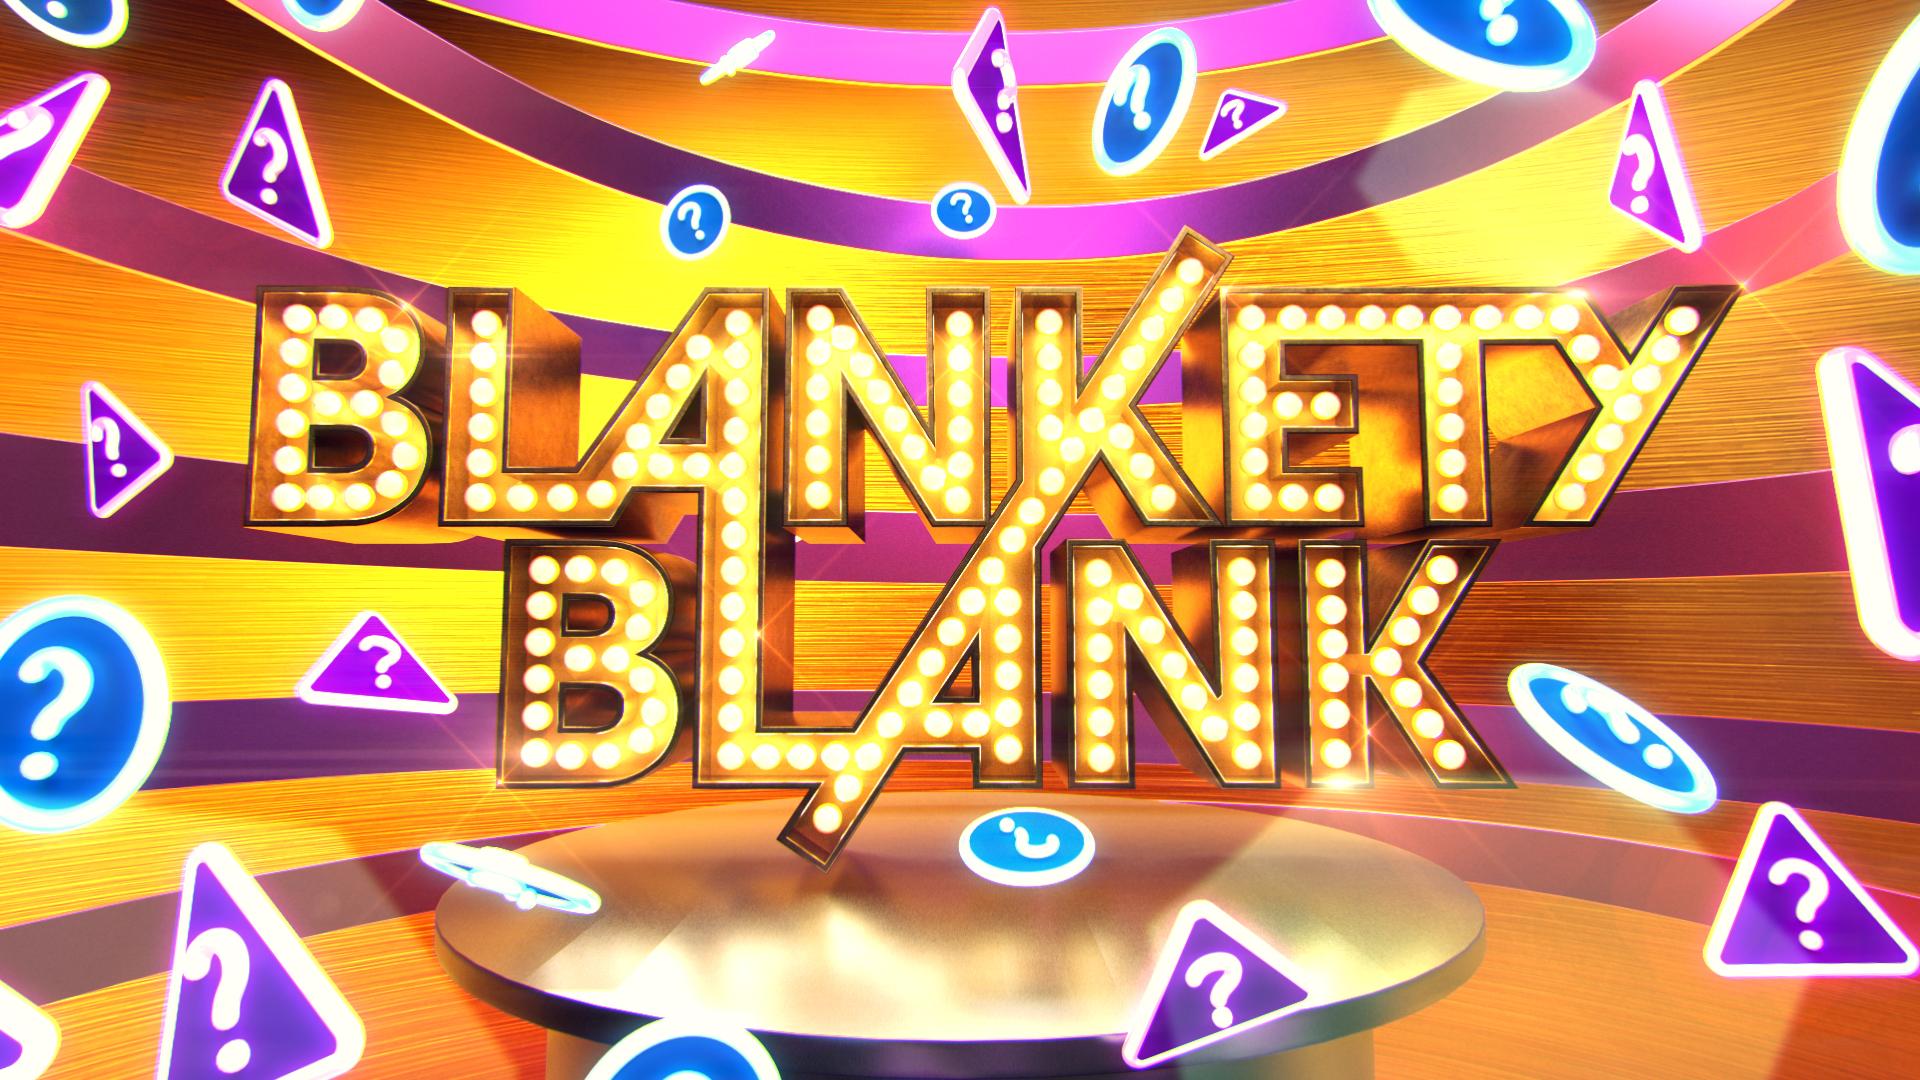 Blankety-Blank-